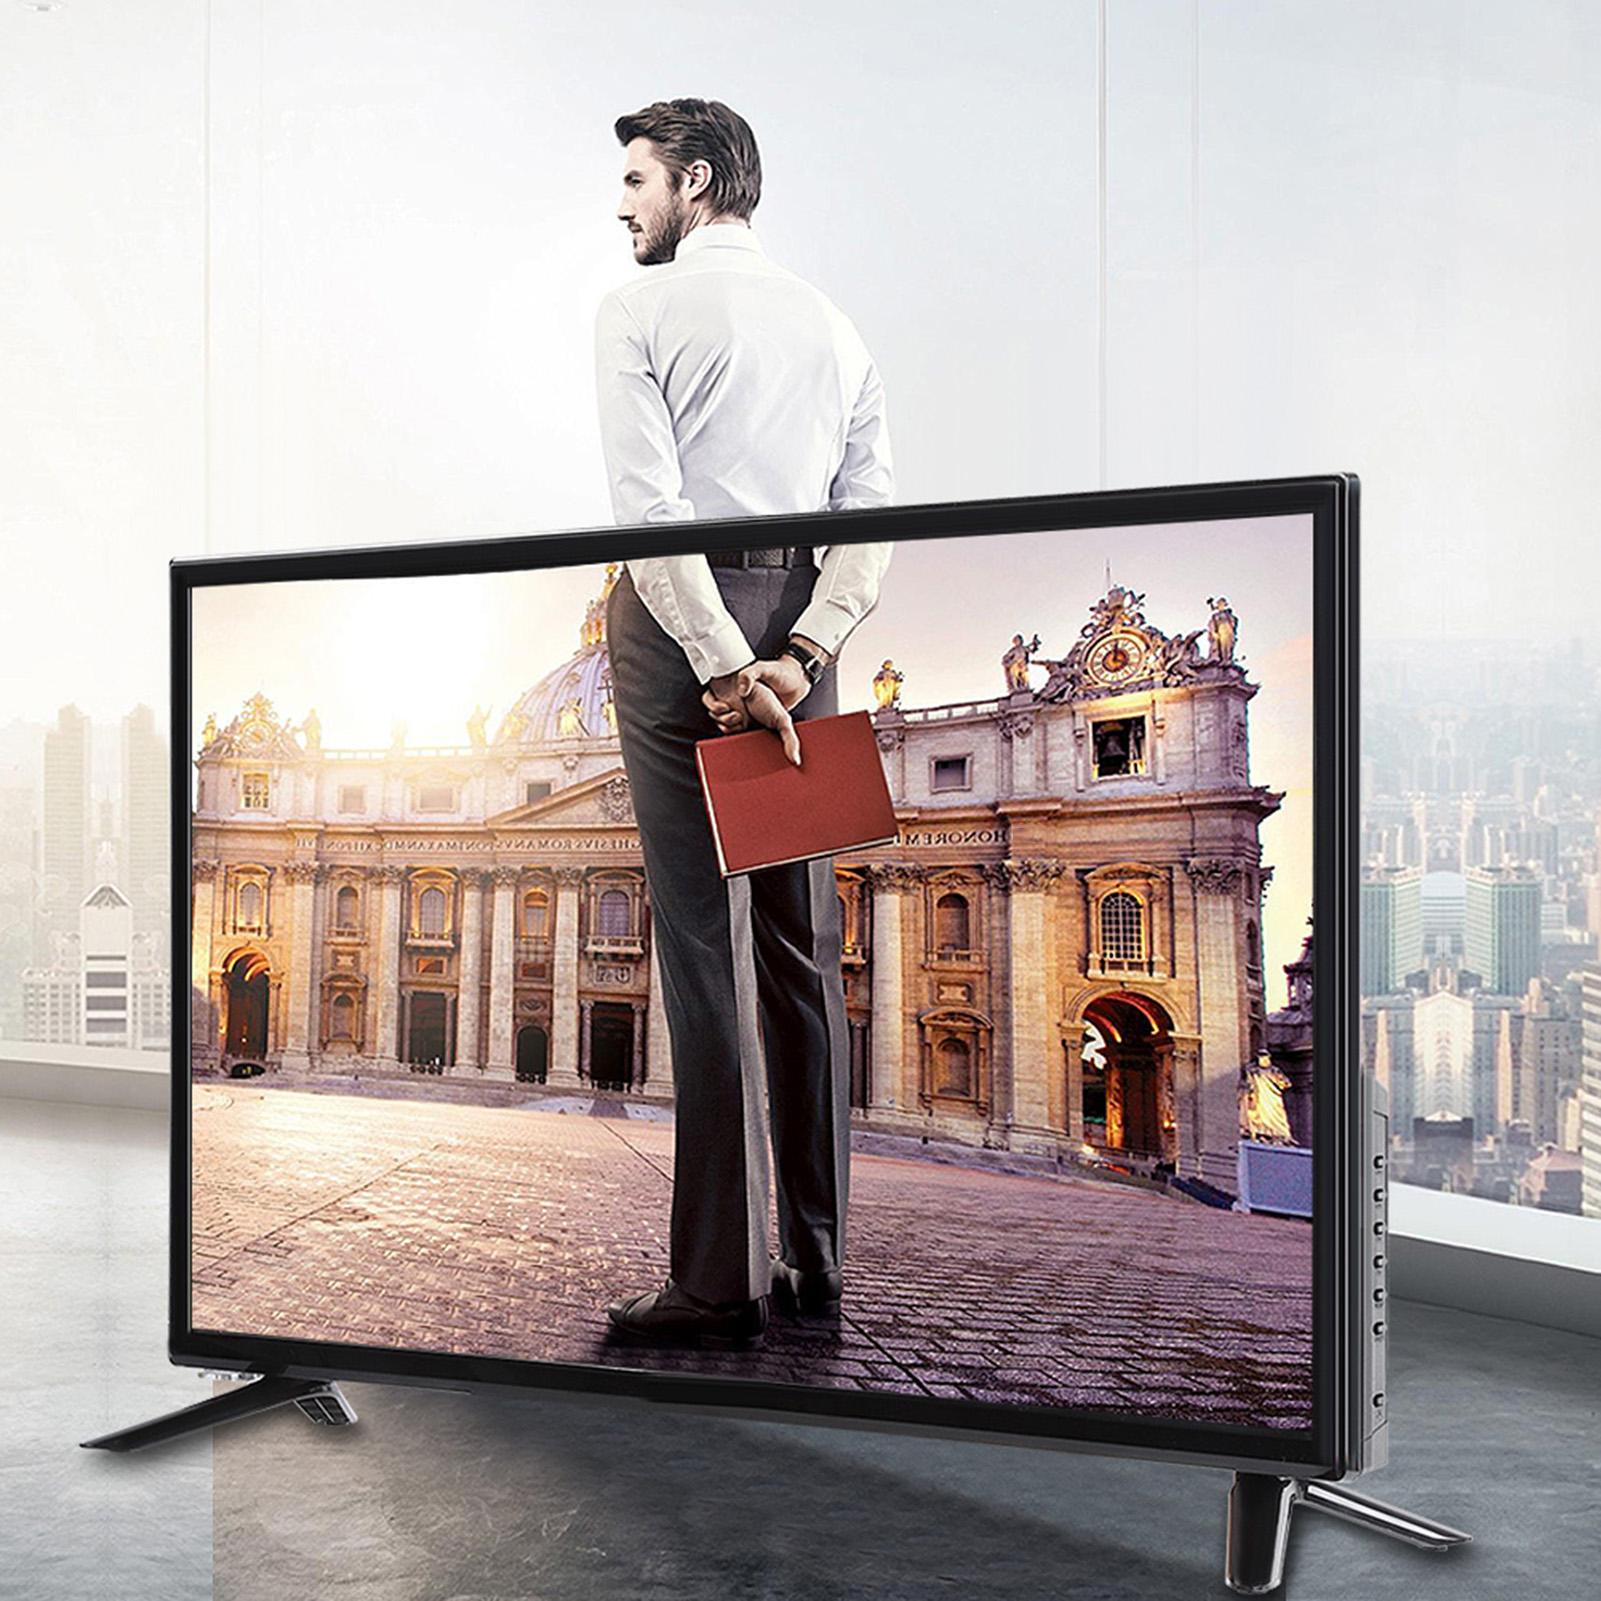 43inch-4K-WiFi-Network-HD-Smart-LCD-TV-HDR-Flat-Screen-Television-HDMI-USB-60HZ miniature 43